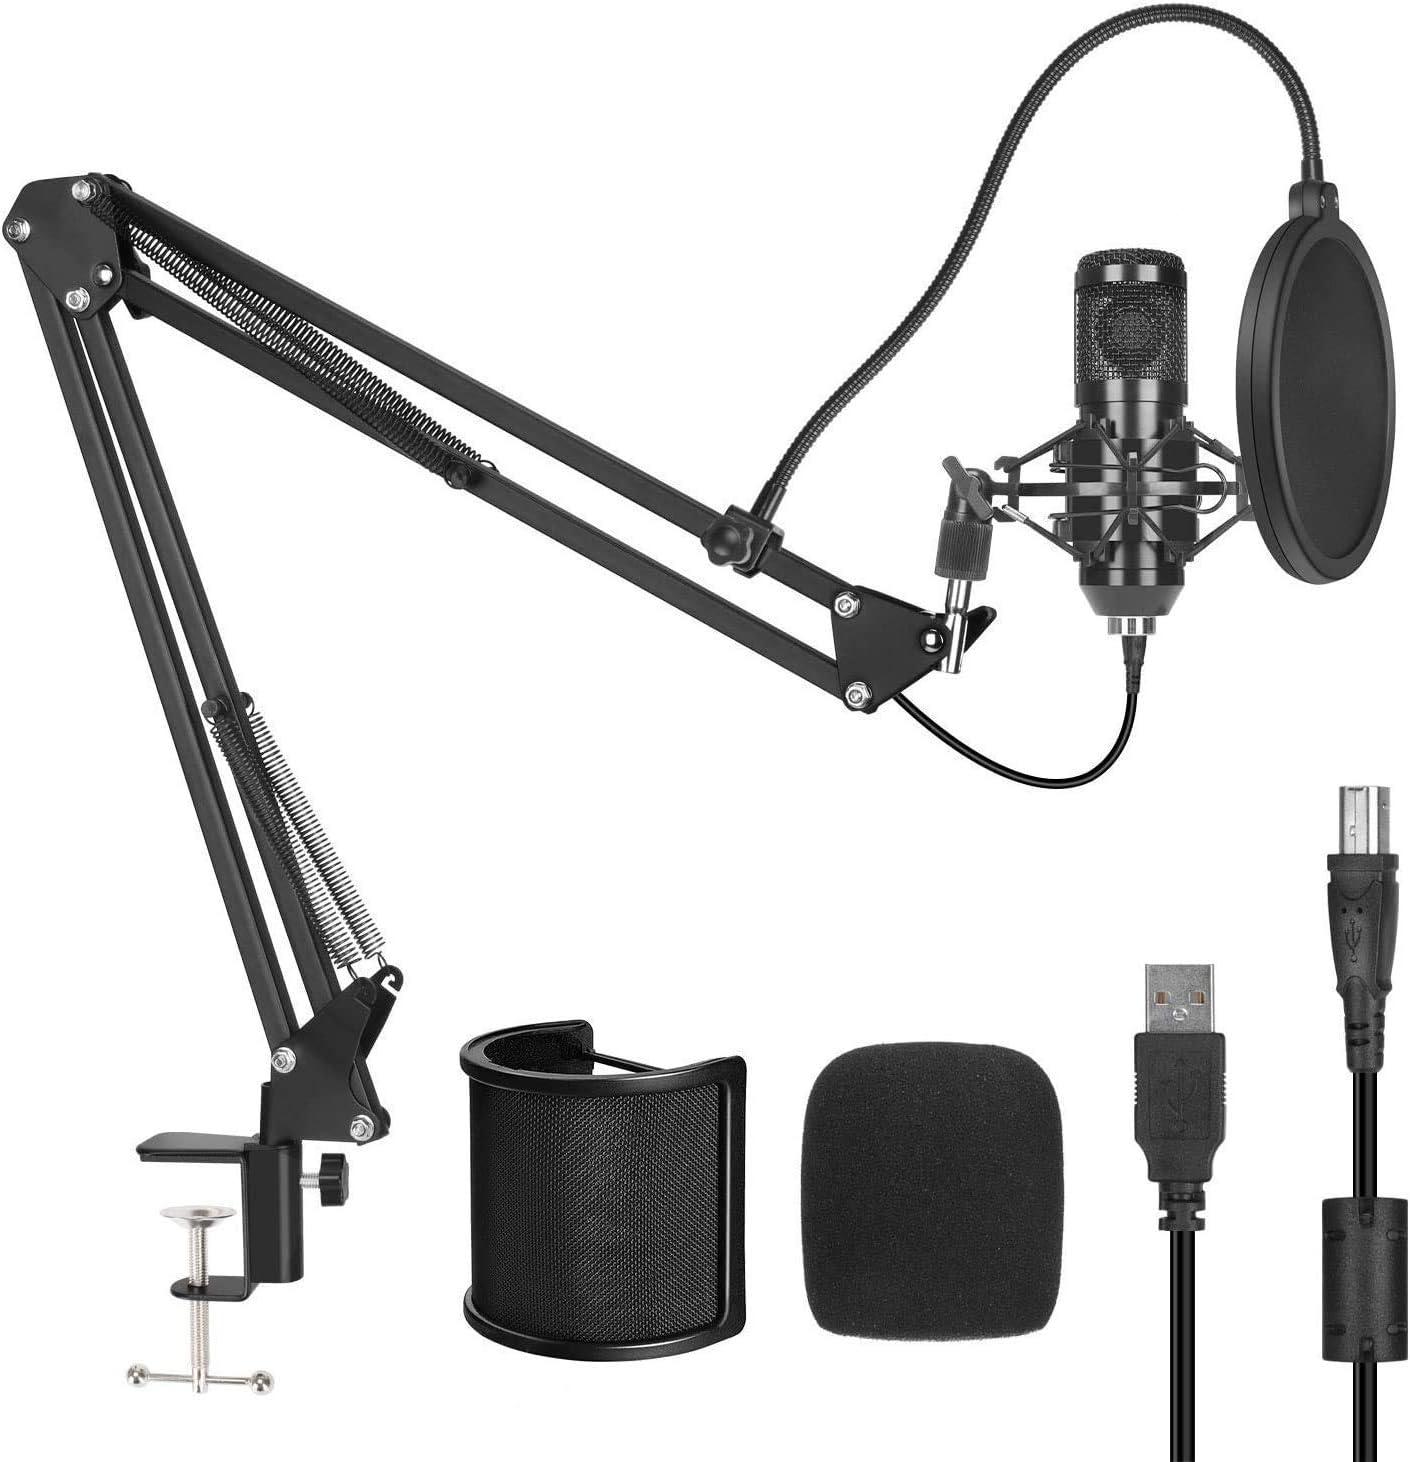 Cheap bargain Pop Filter Studio USB Condenser Sale price Microphone Computer Recording